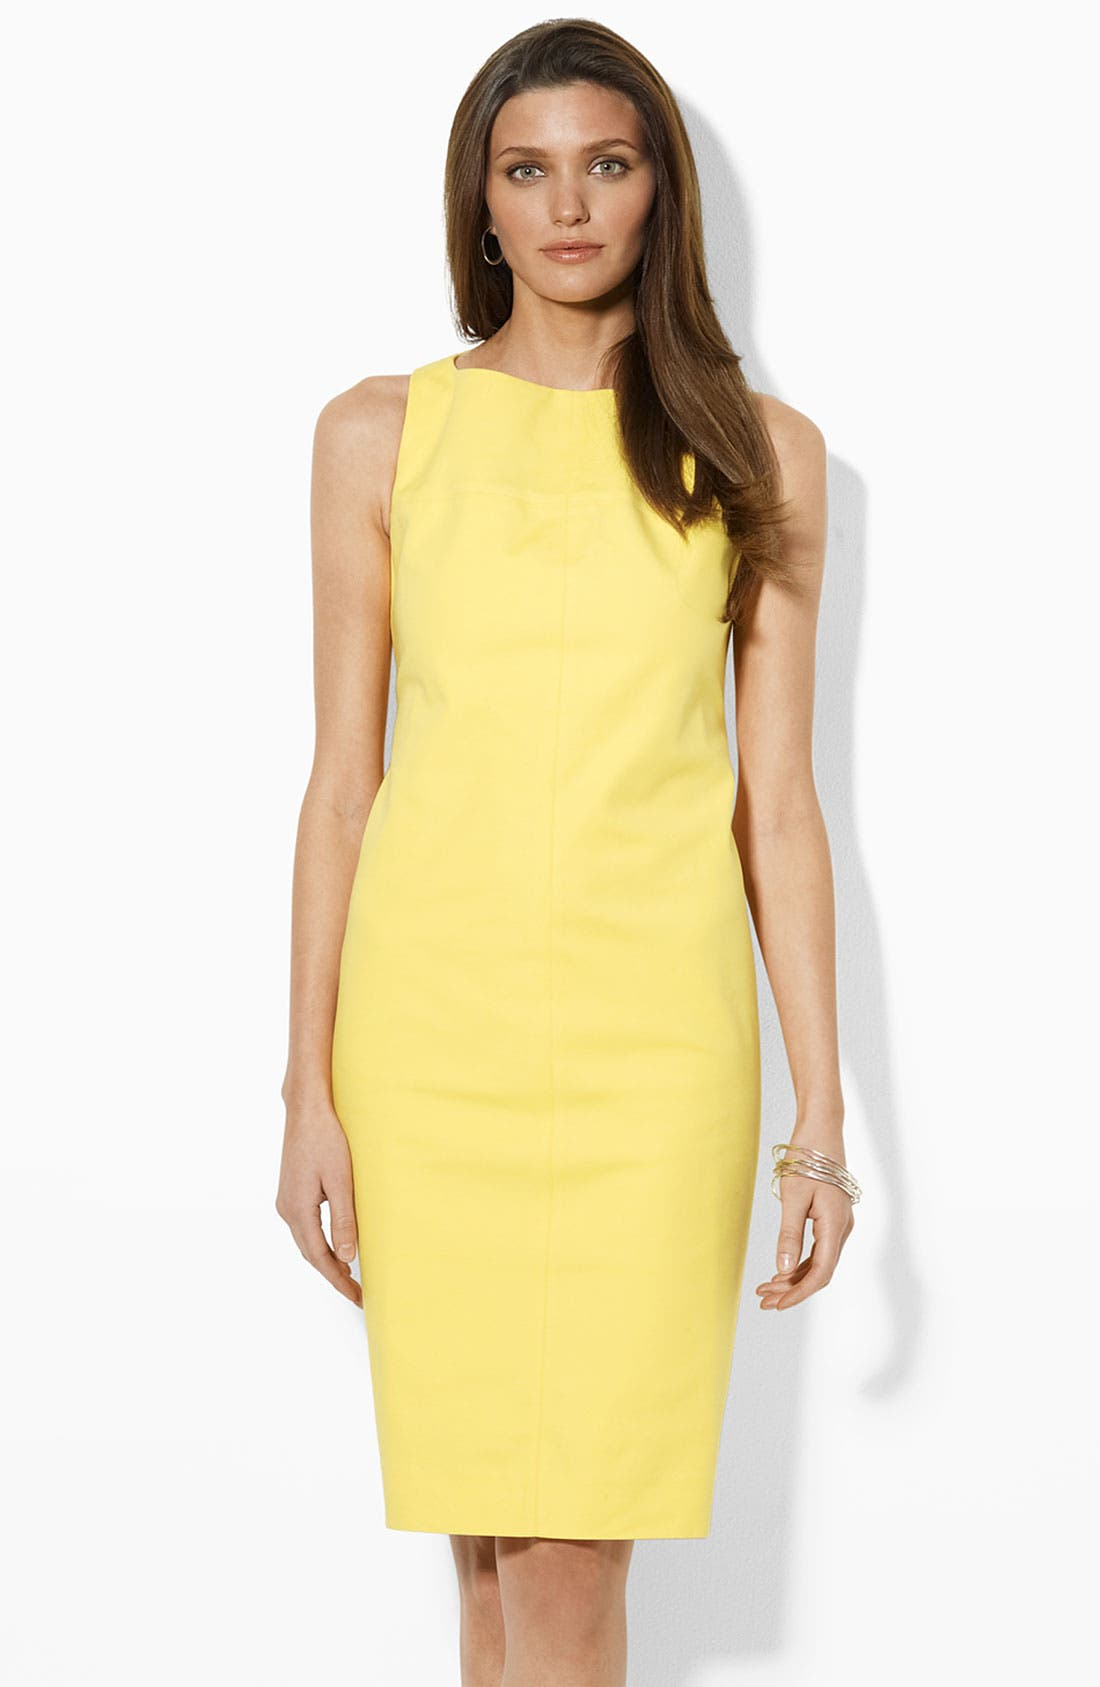 Alternate Image 1 Selected - Lauren by Ralph Lauren Sleeveless Sheath Dress